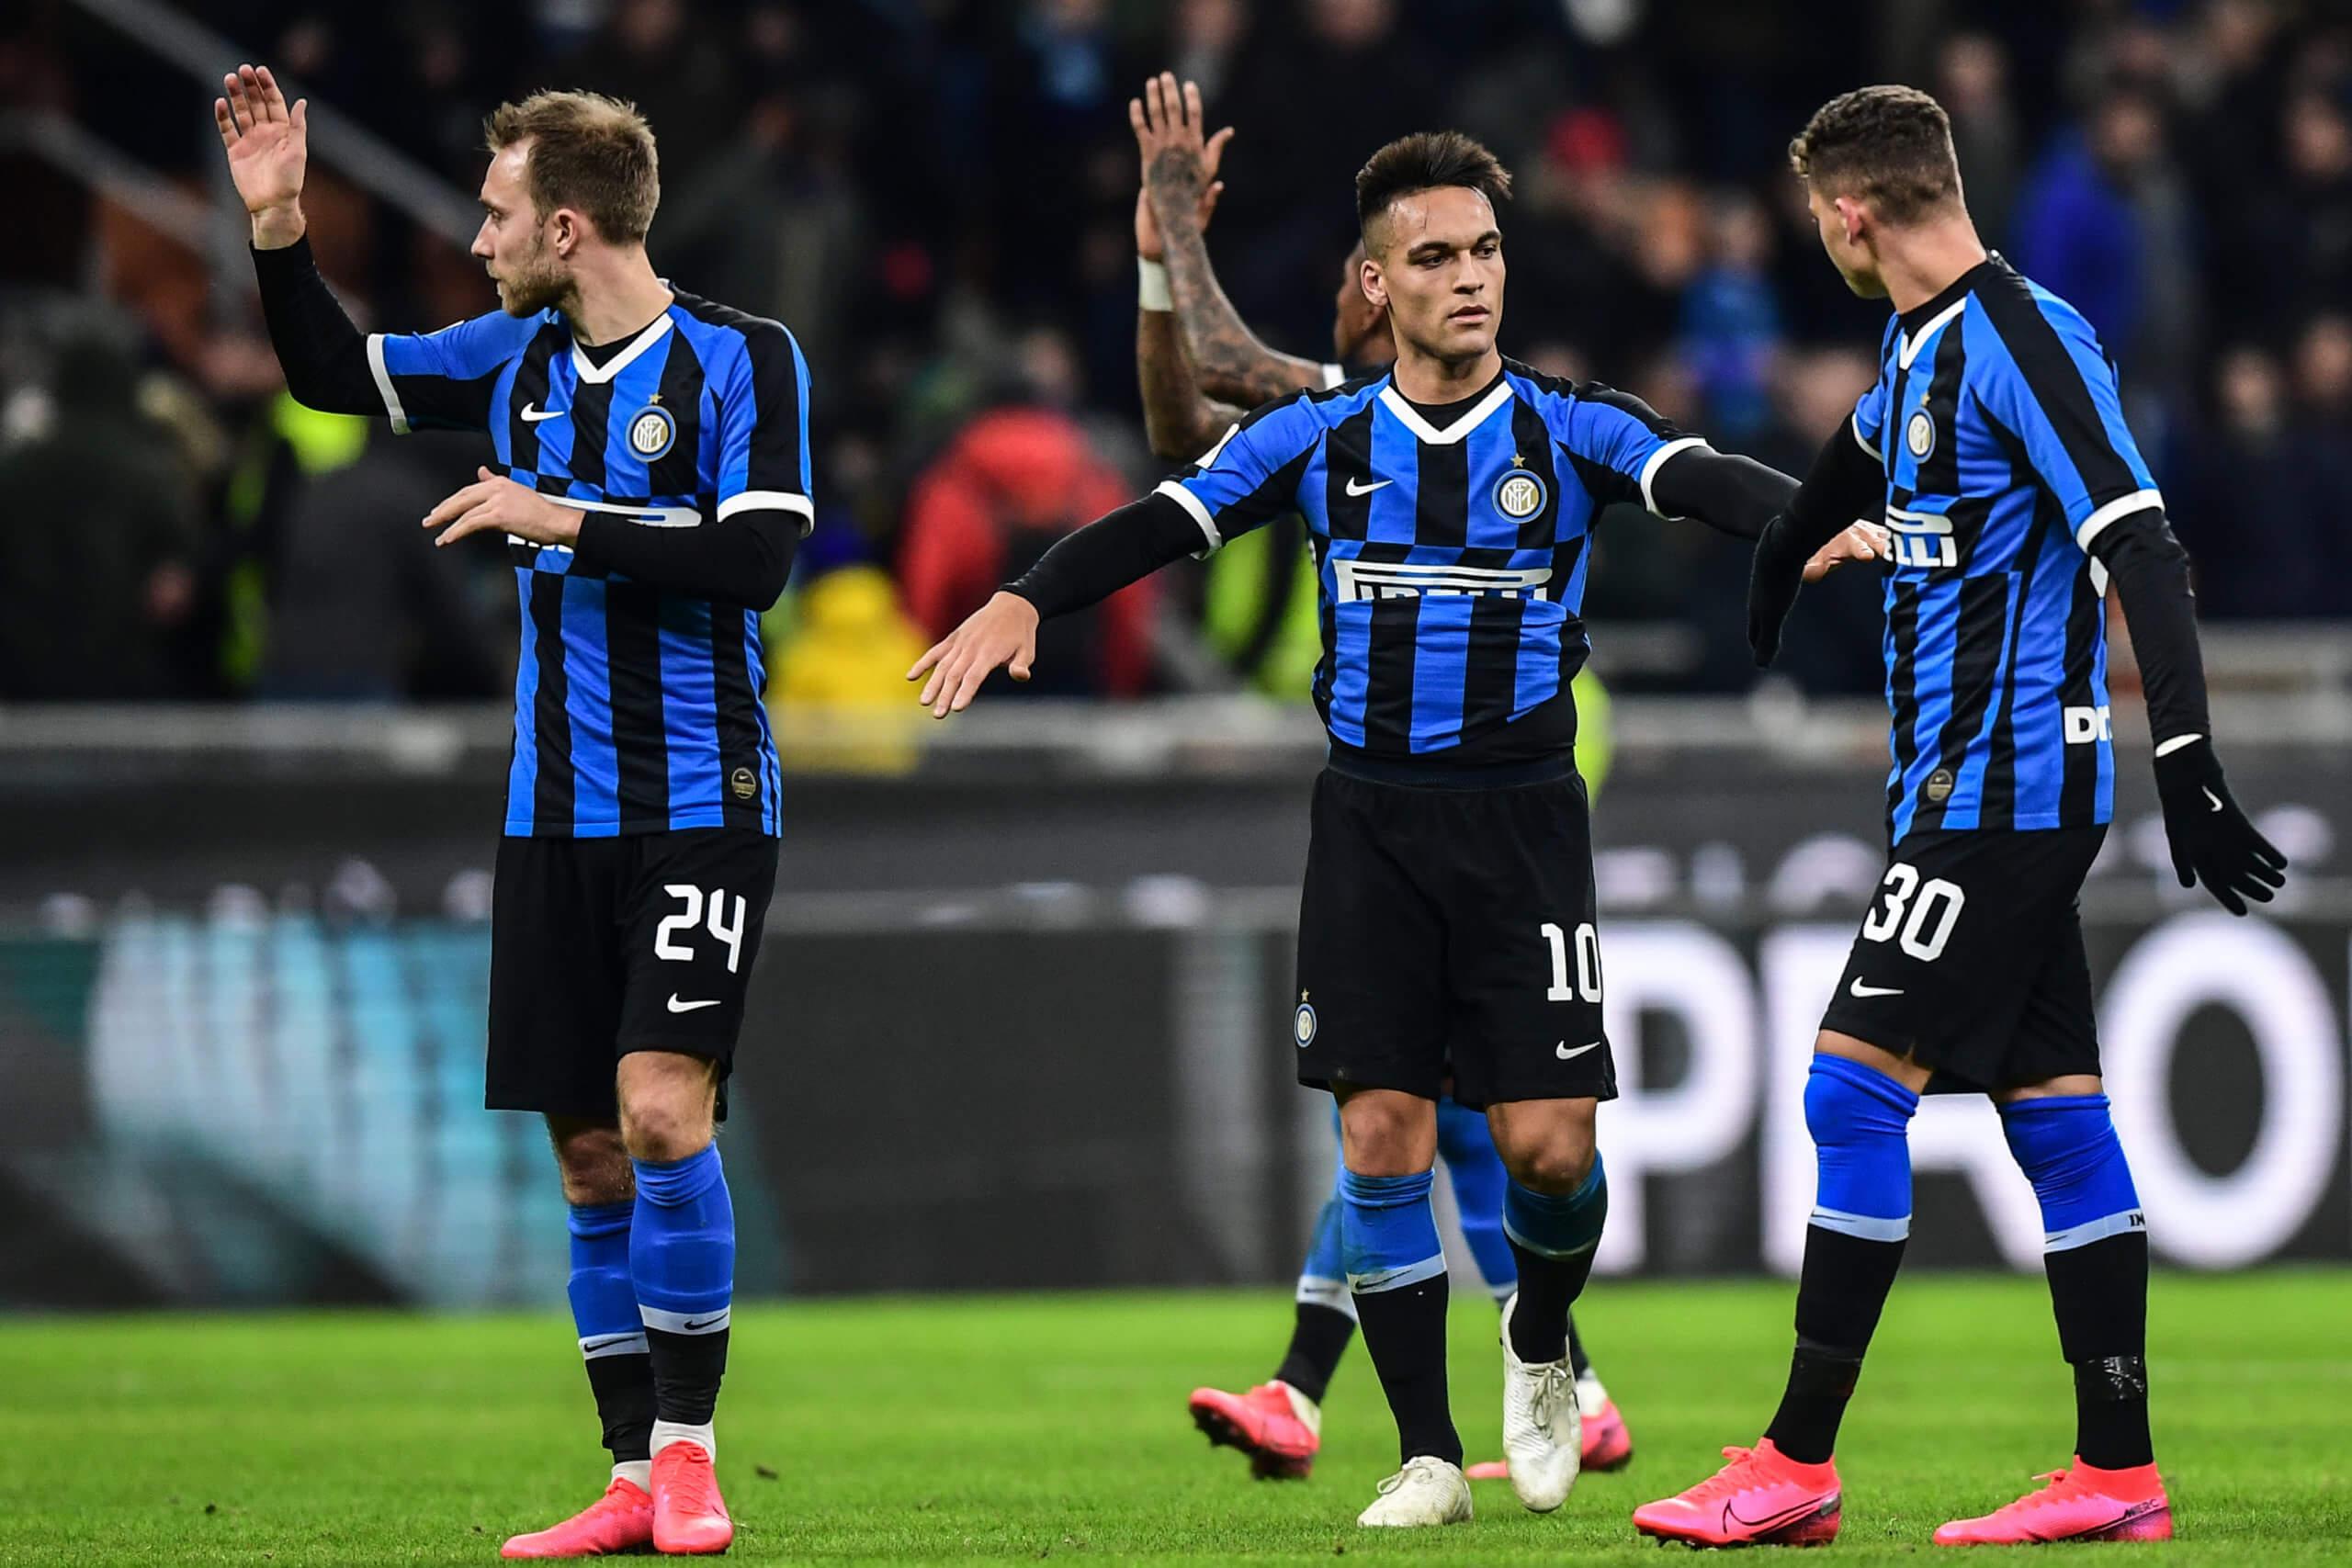 Inter steht im Coppa Italia Halbfinale